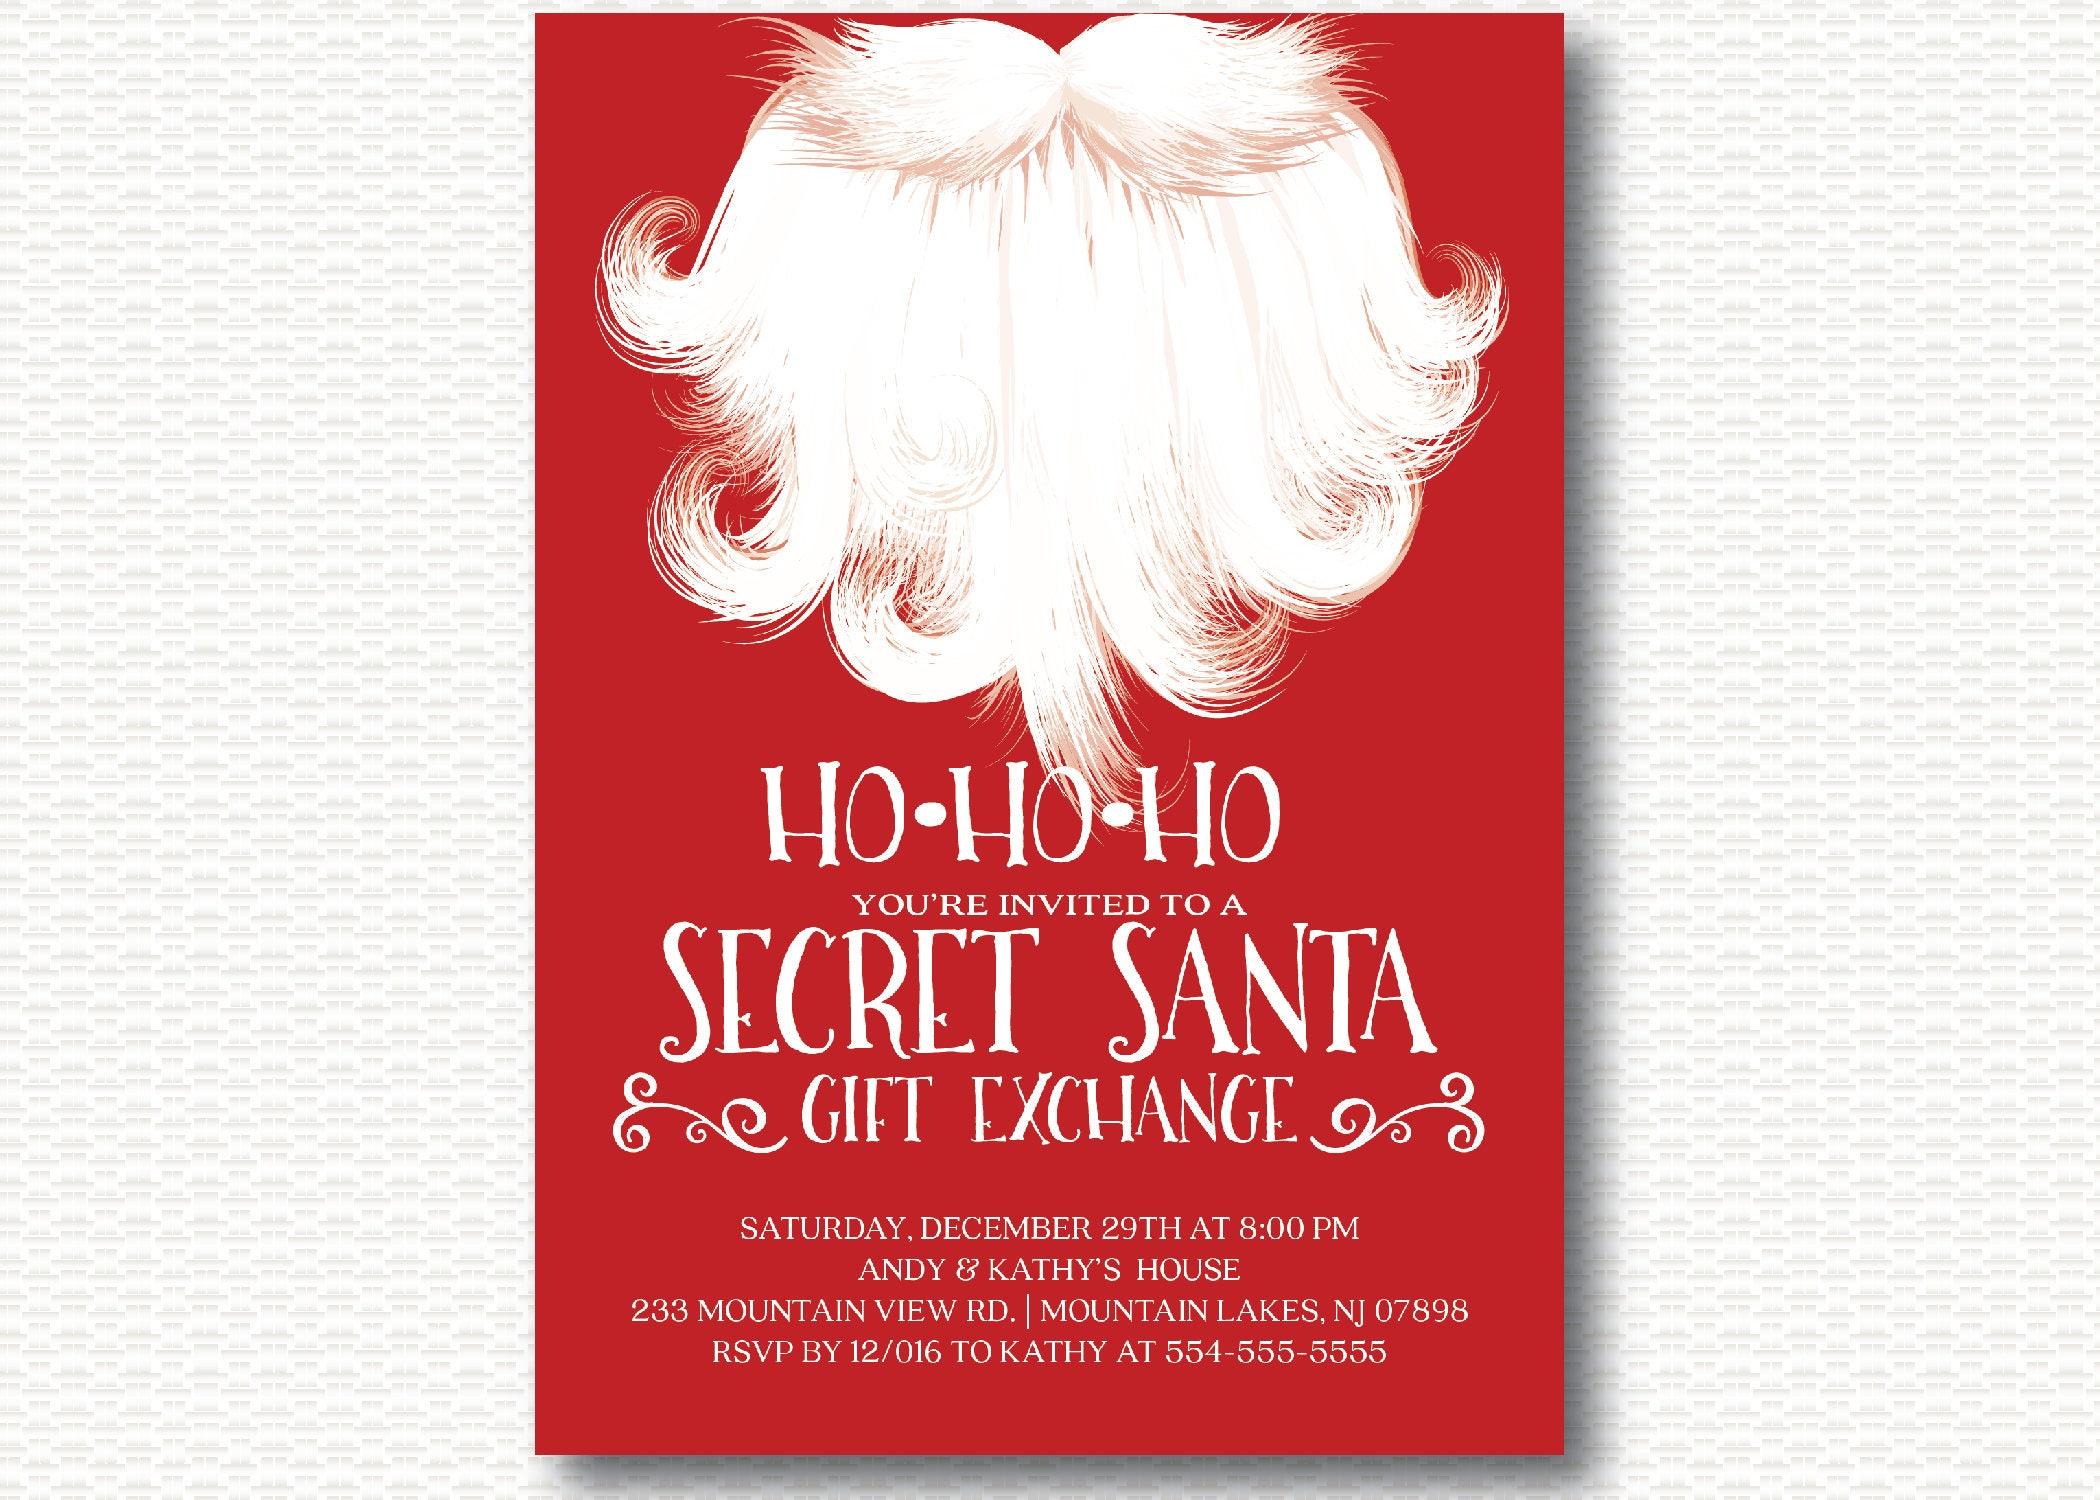 Secret Santa Invitation Holiday Party Gift Exchange